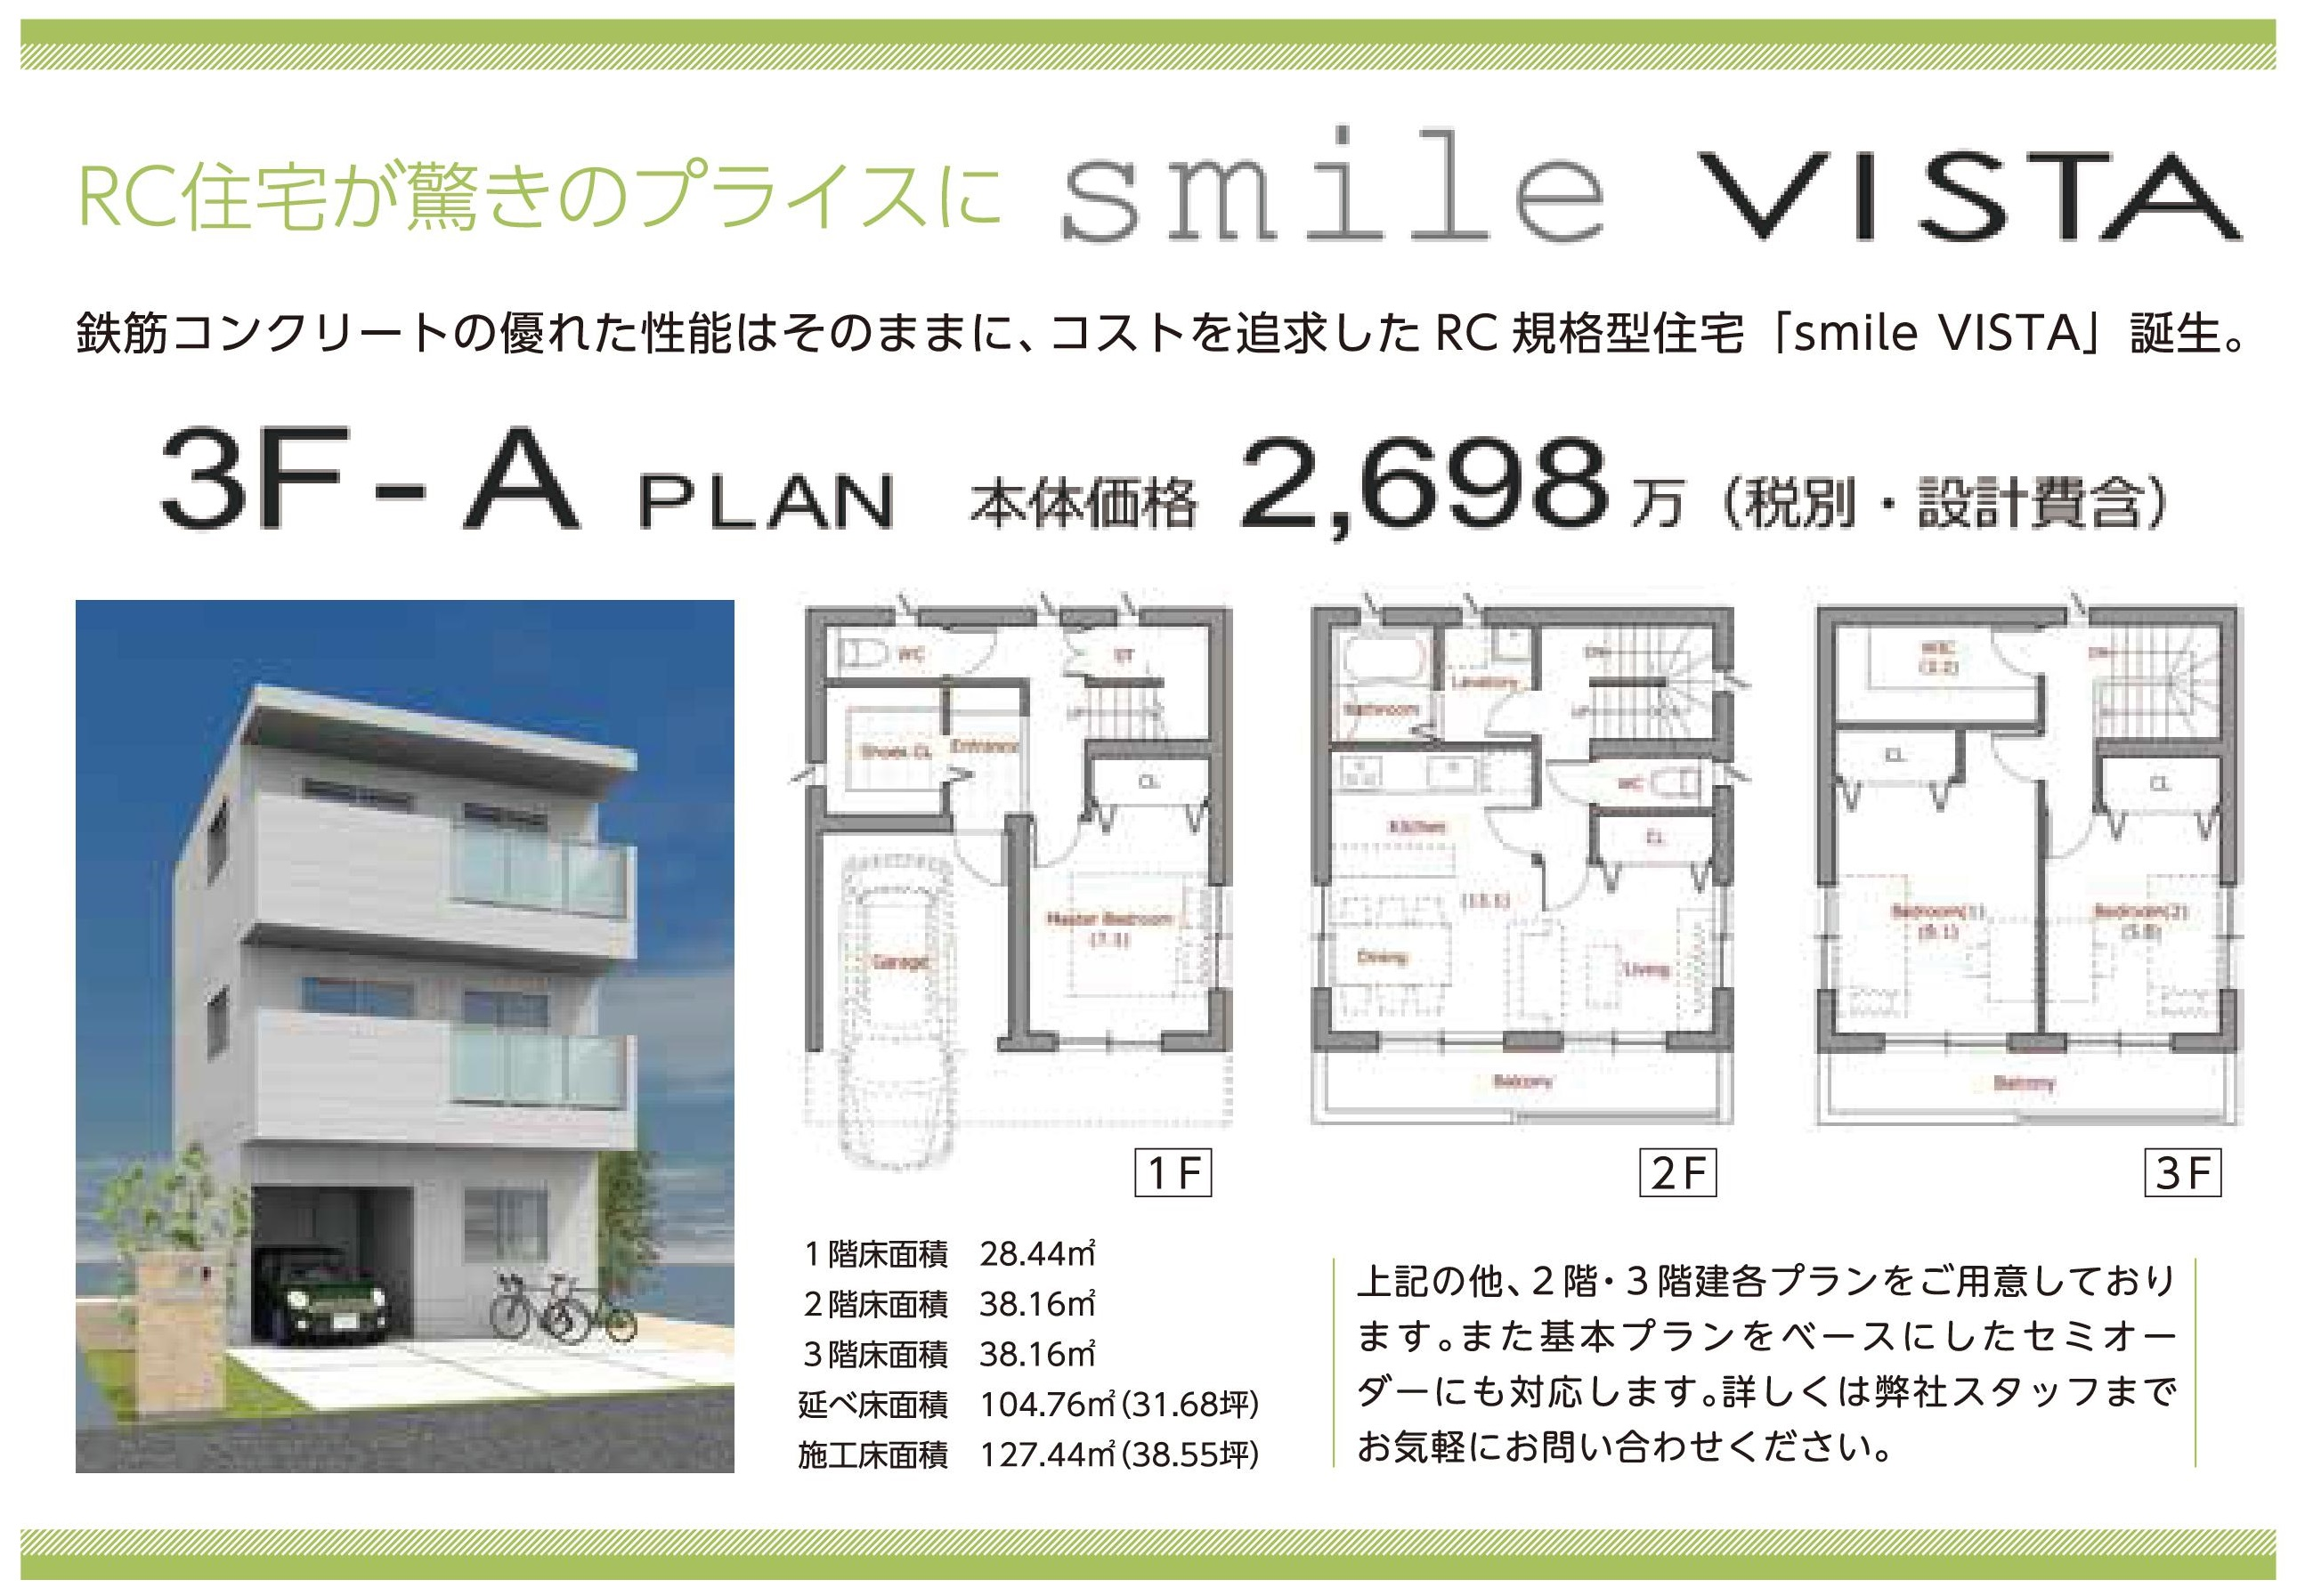 RC規格型住宅「smile VISTA」